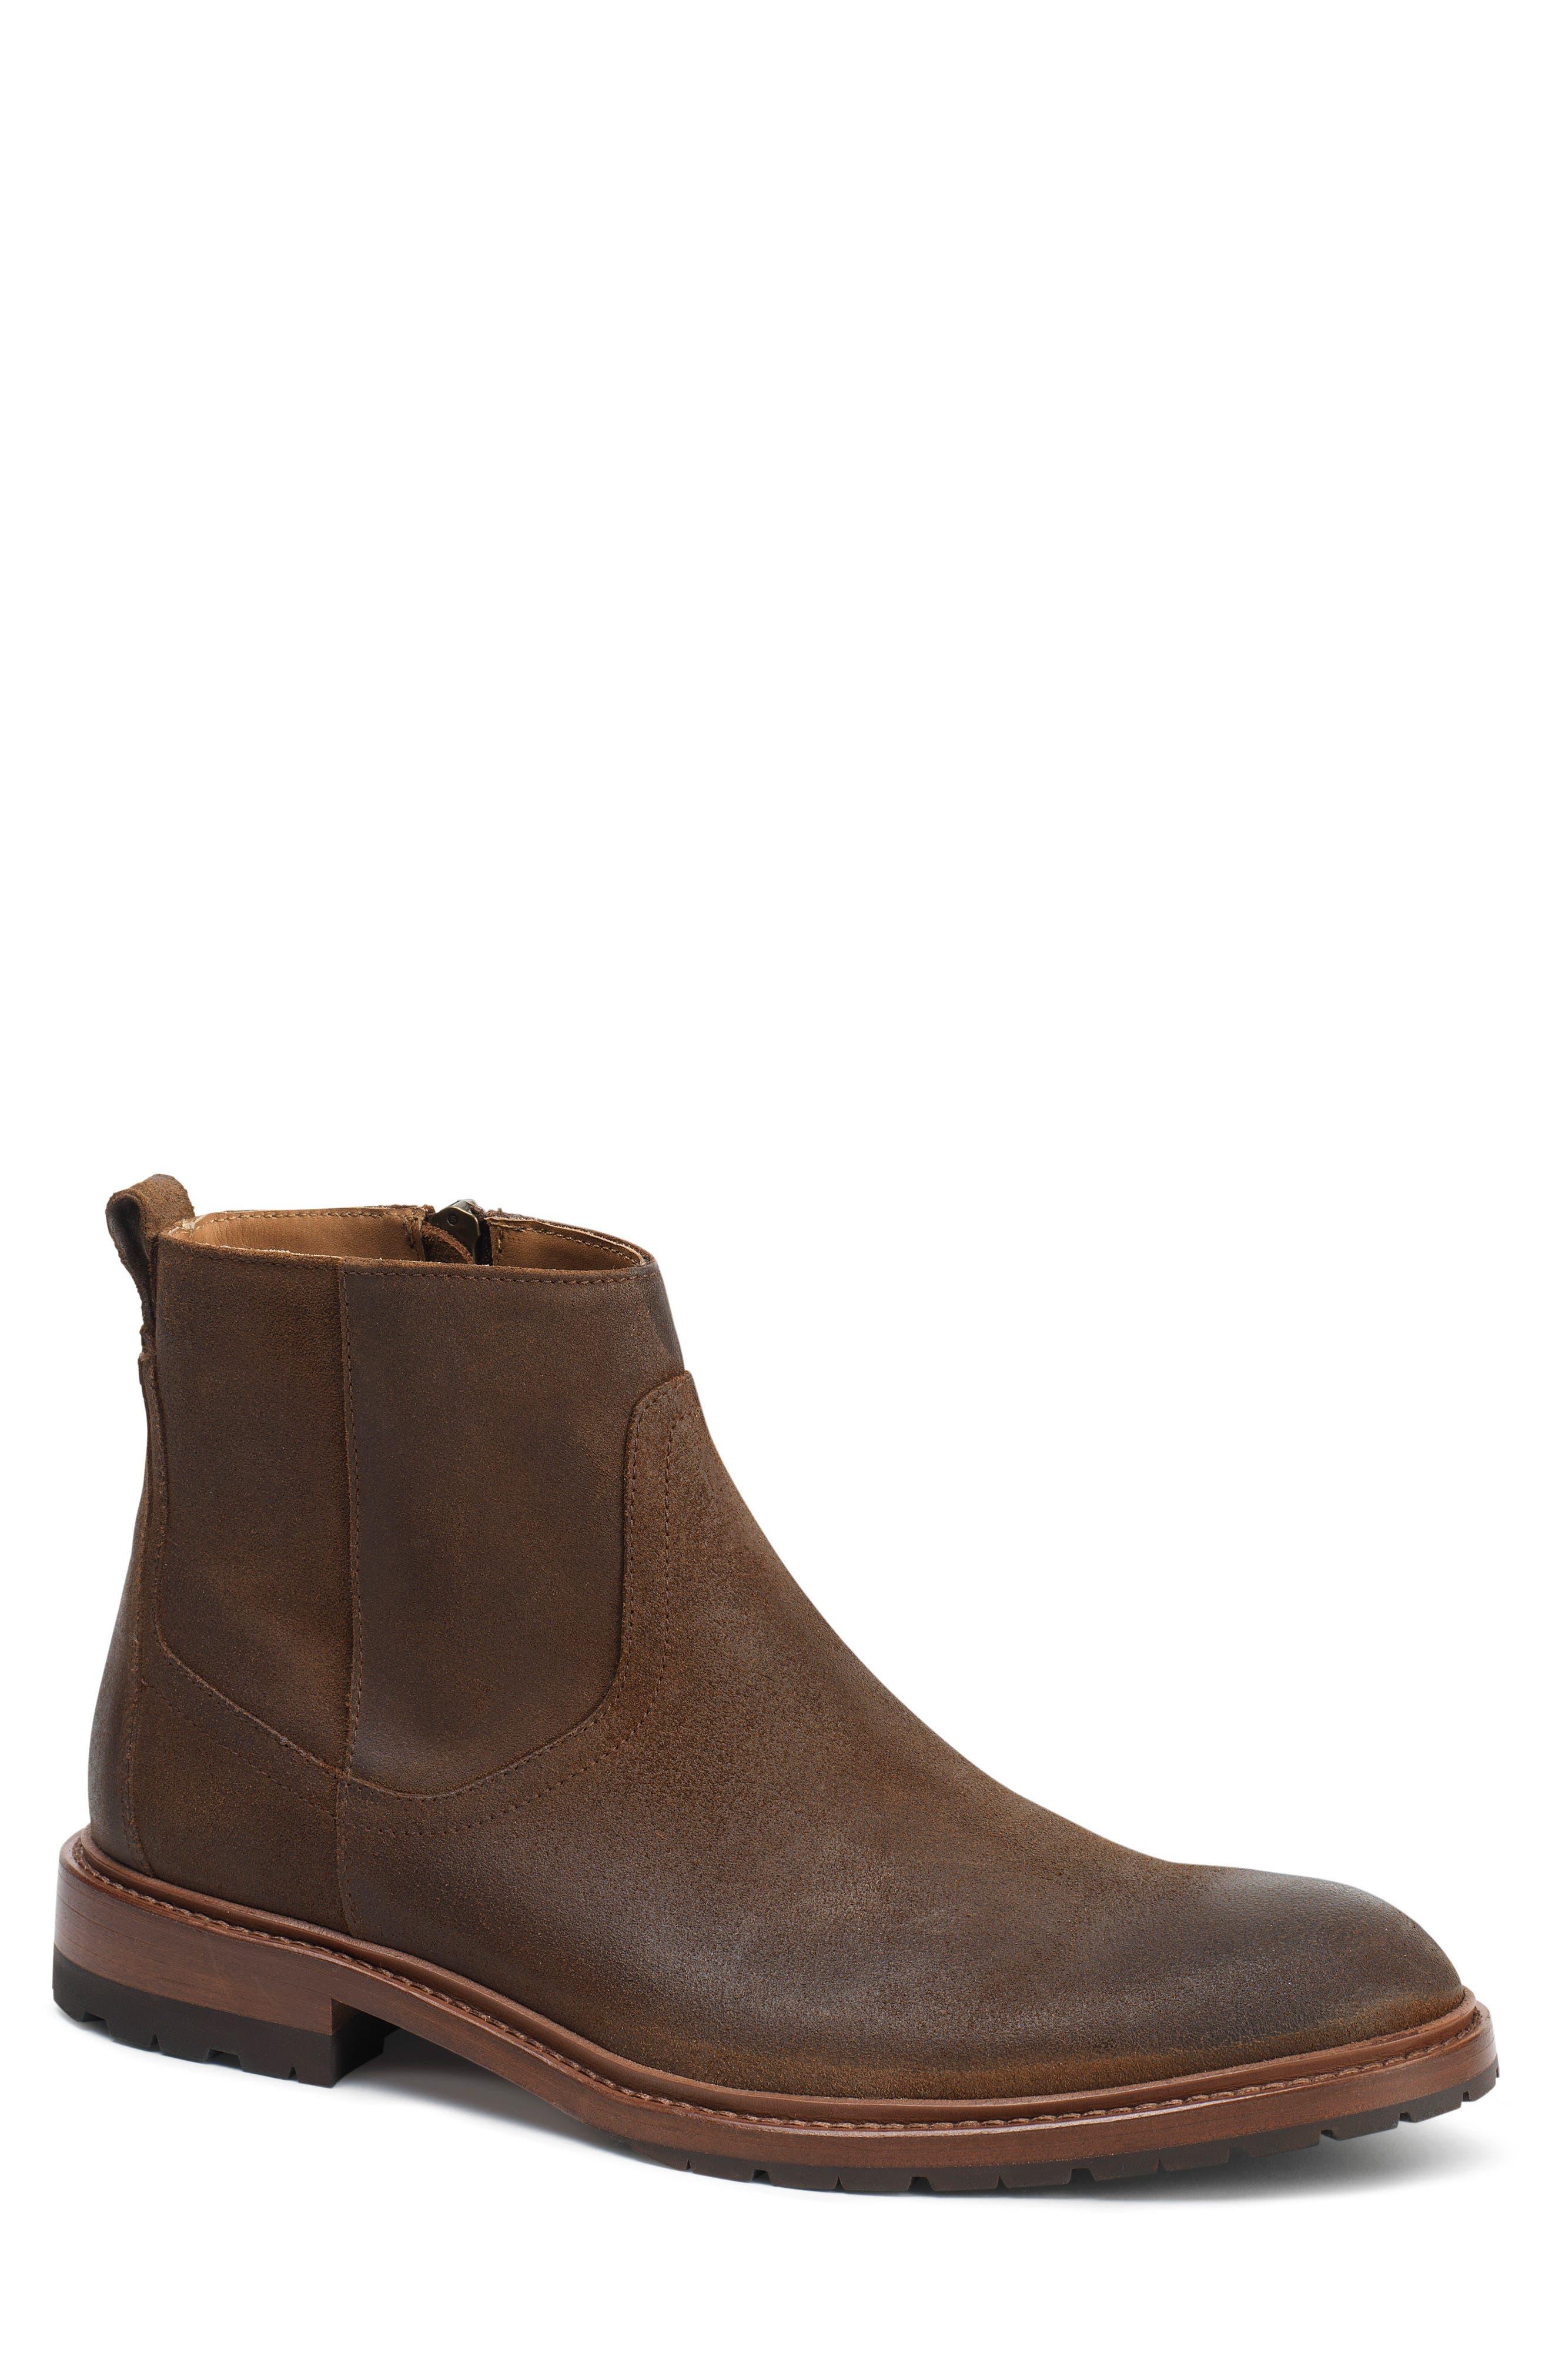 Larkin Zip Boot,                             Main thumbnail 1, color,                             Brown Waxed Suede